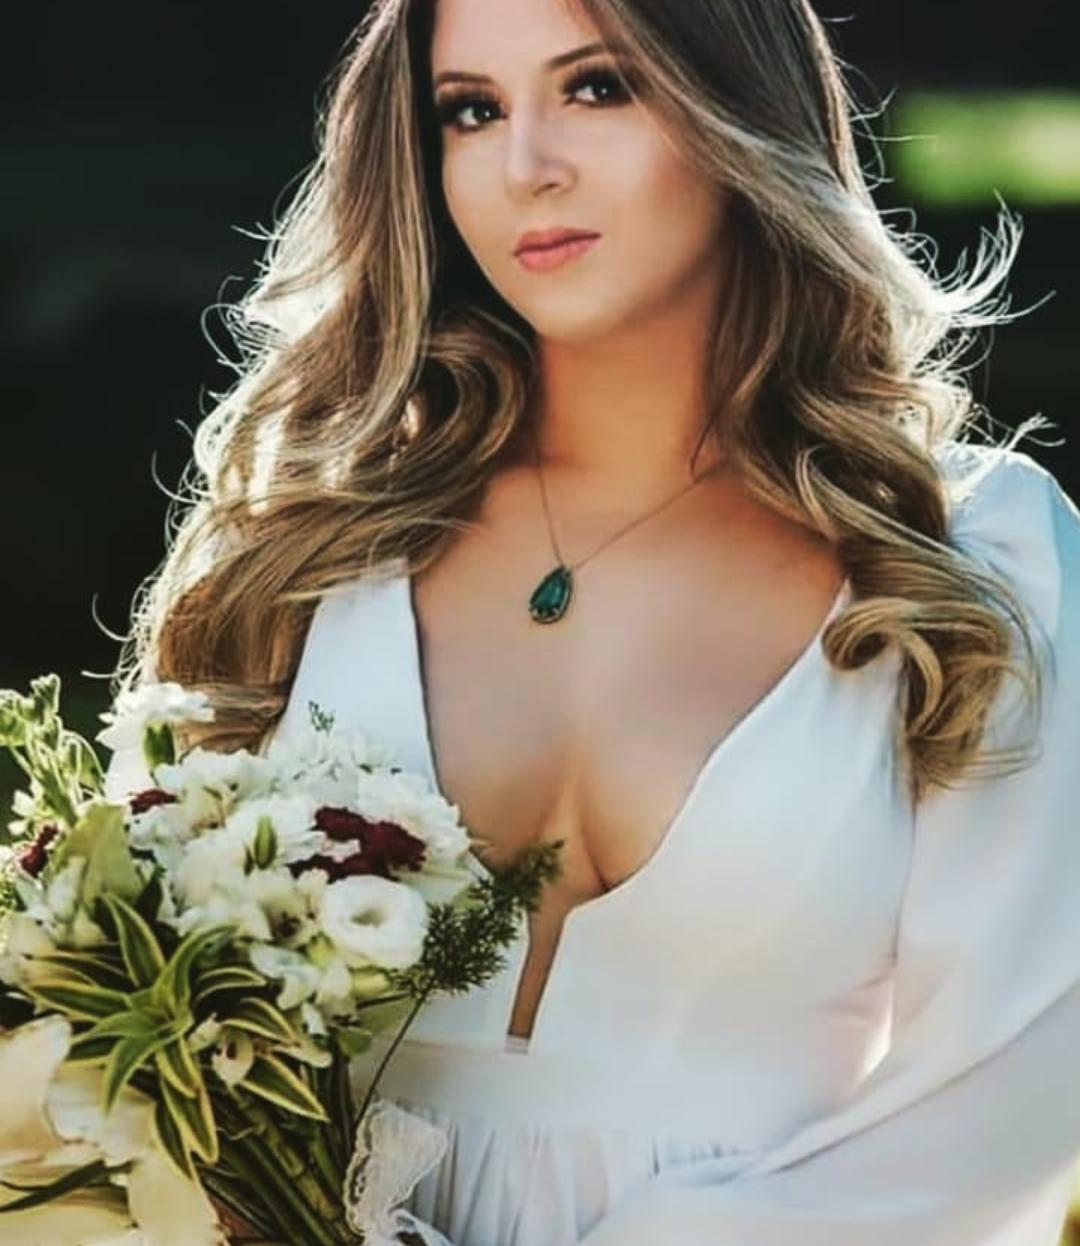 Ateliê Débora Costa